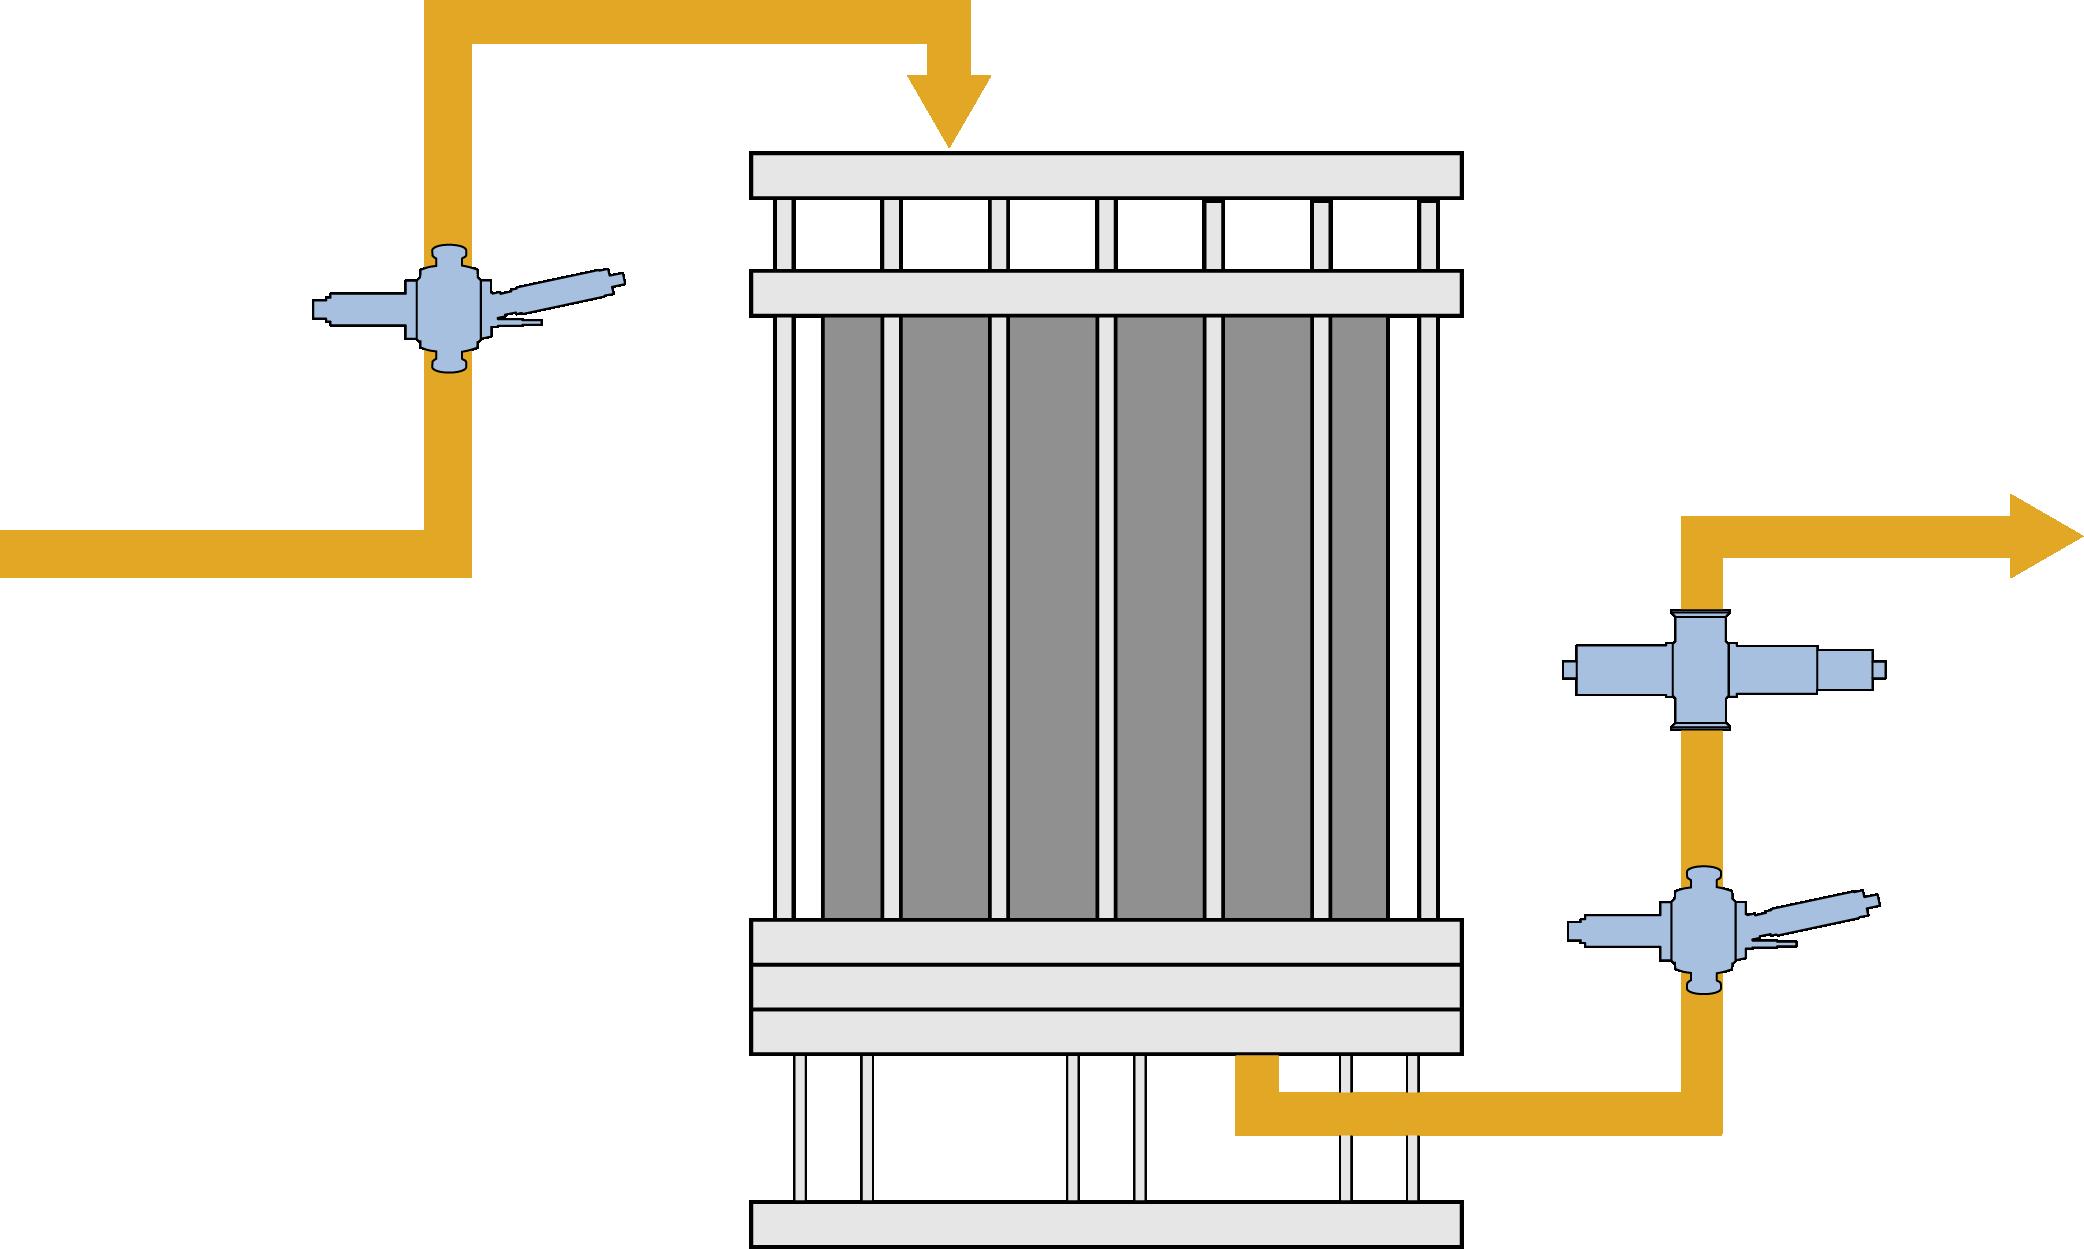 Chromatography Control